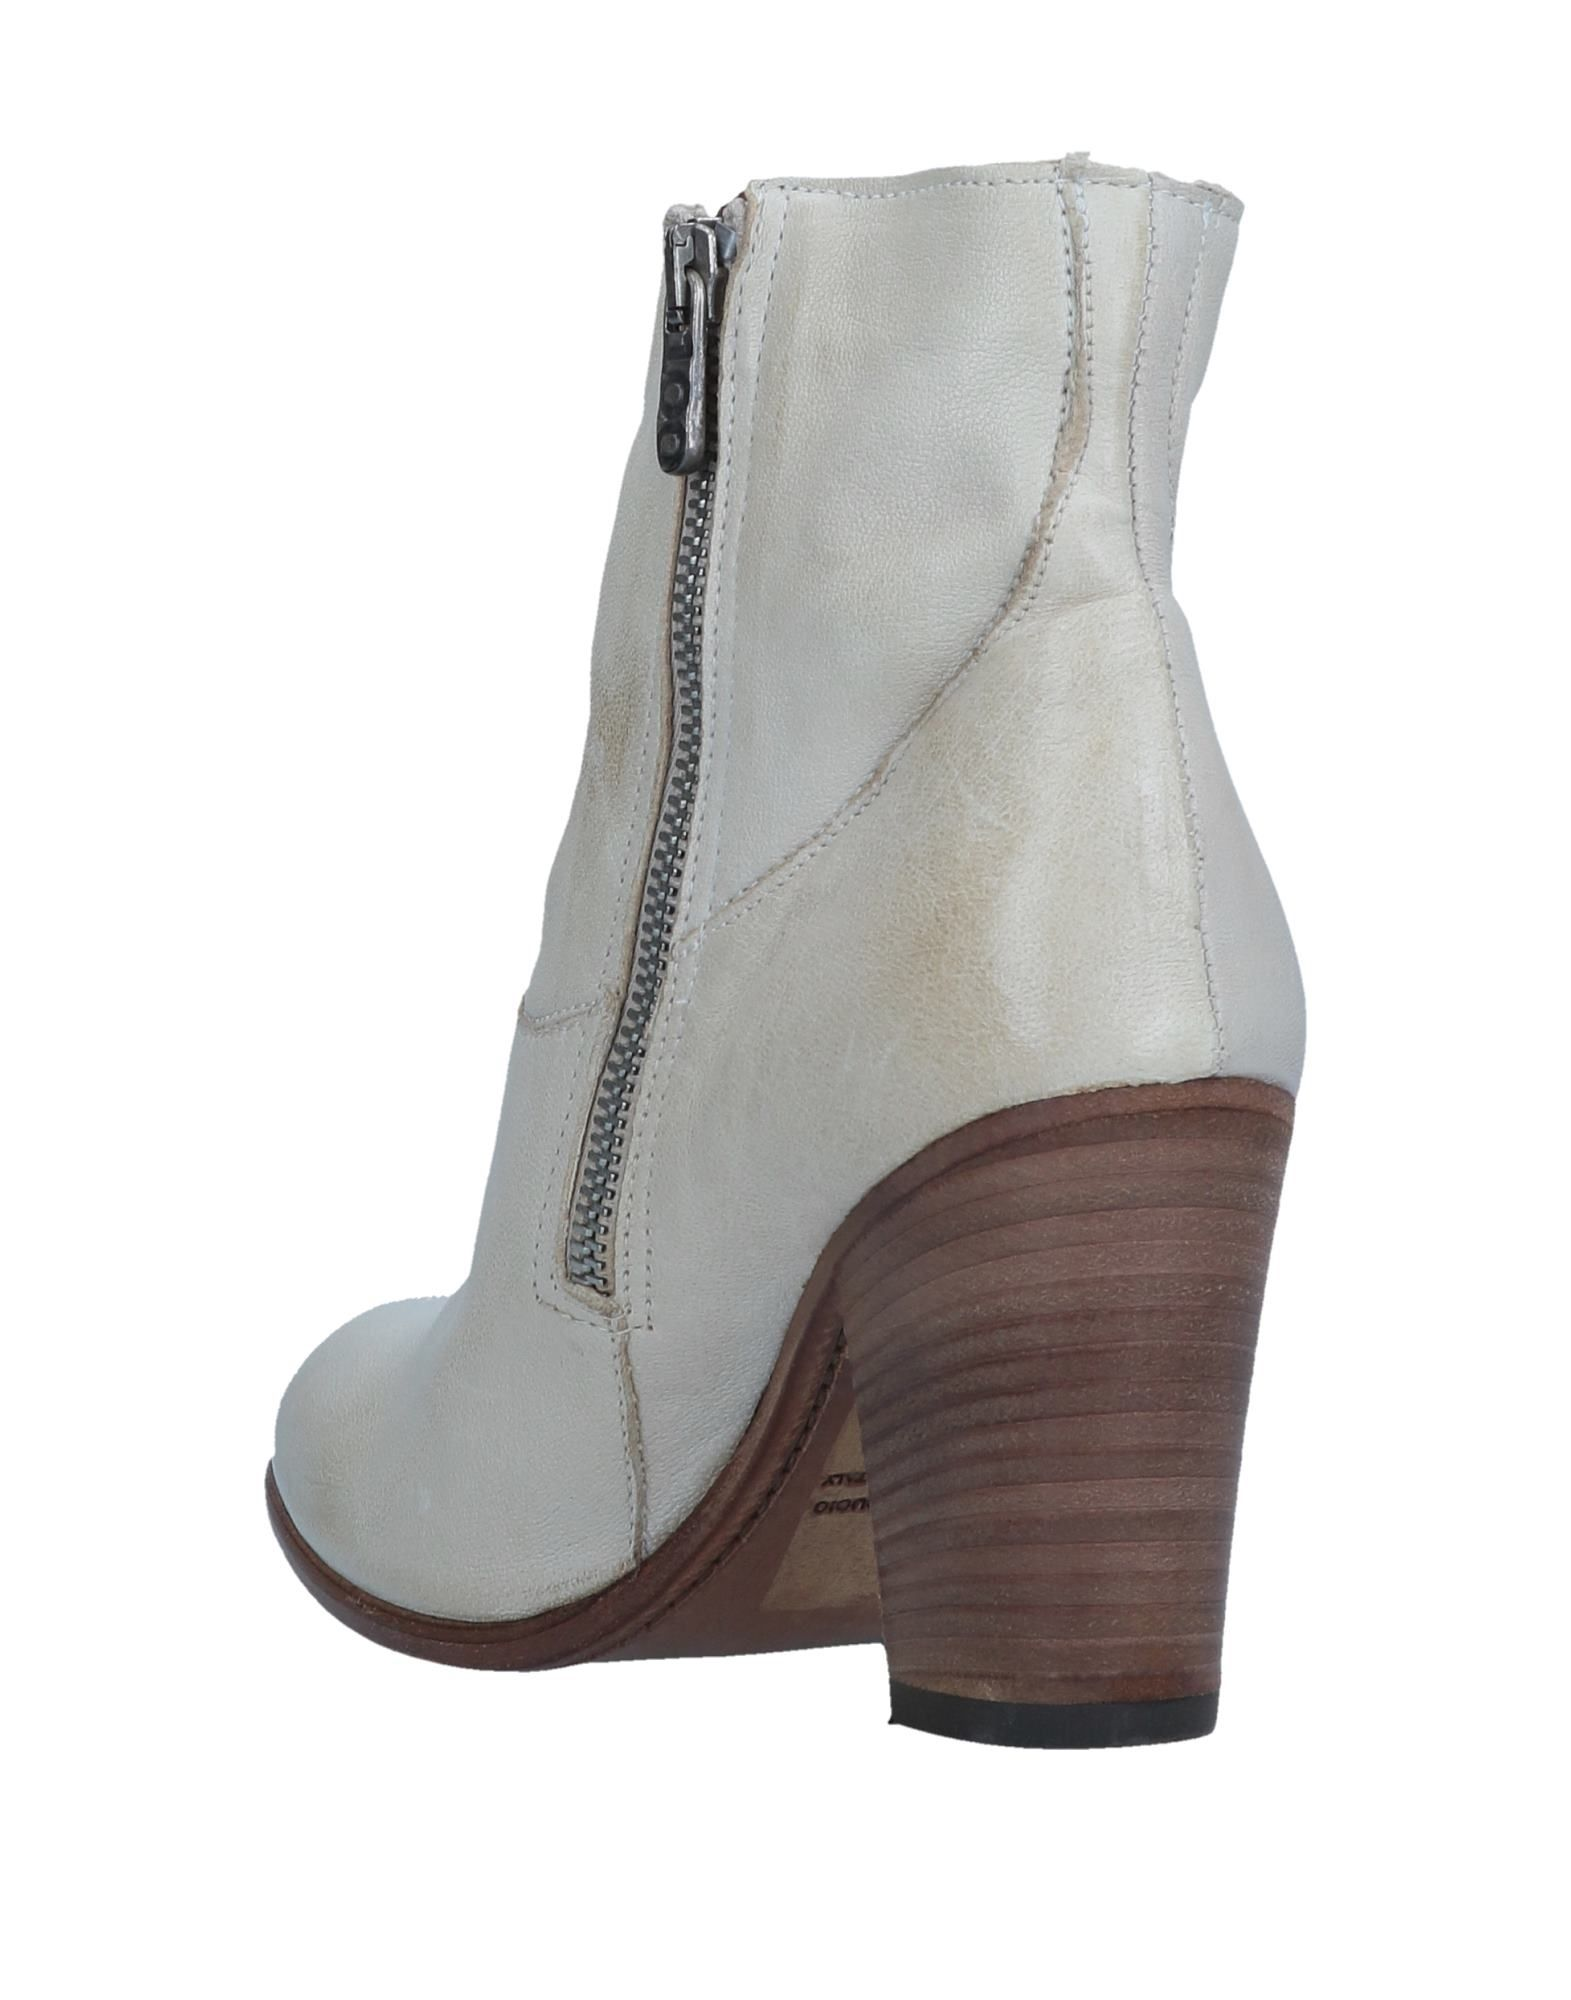 Gut um billige Schuhe Damen zu tragenHundROT 100 Stiefelette Damen Schuhe  11546643AV 0f6631